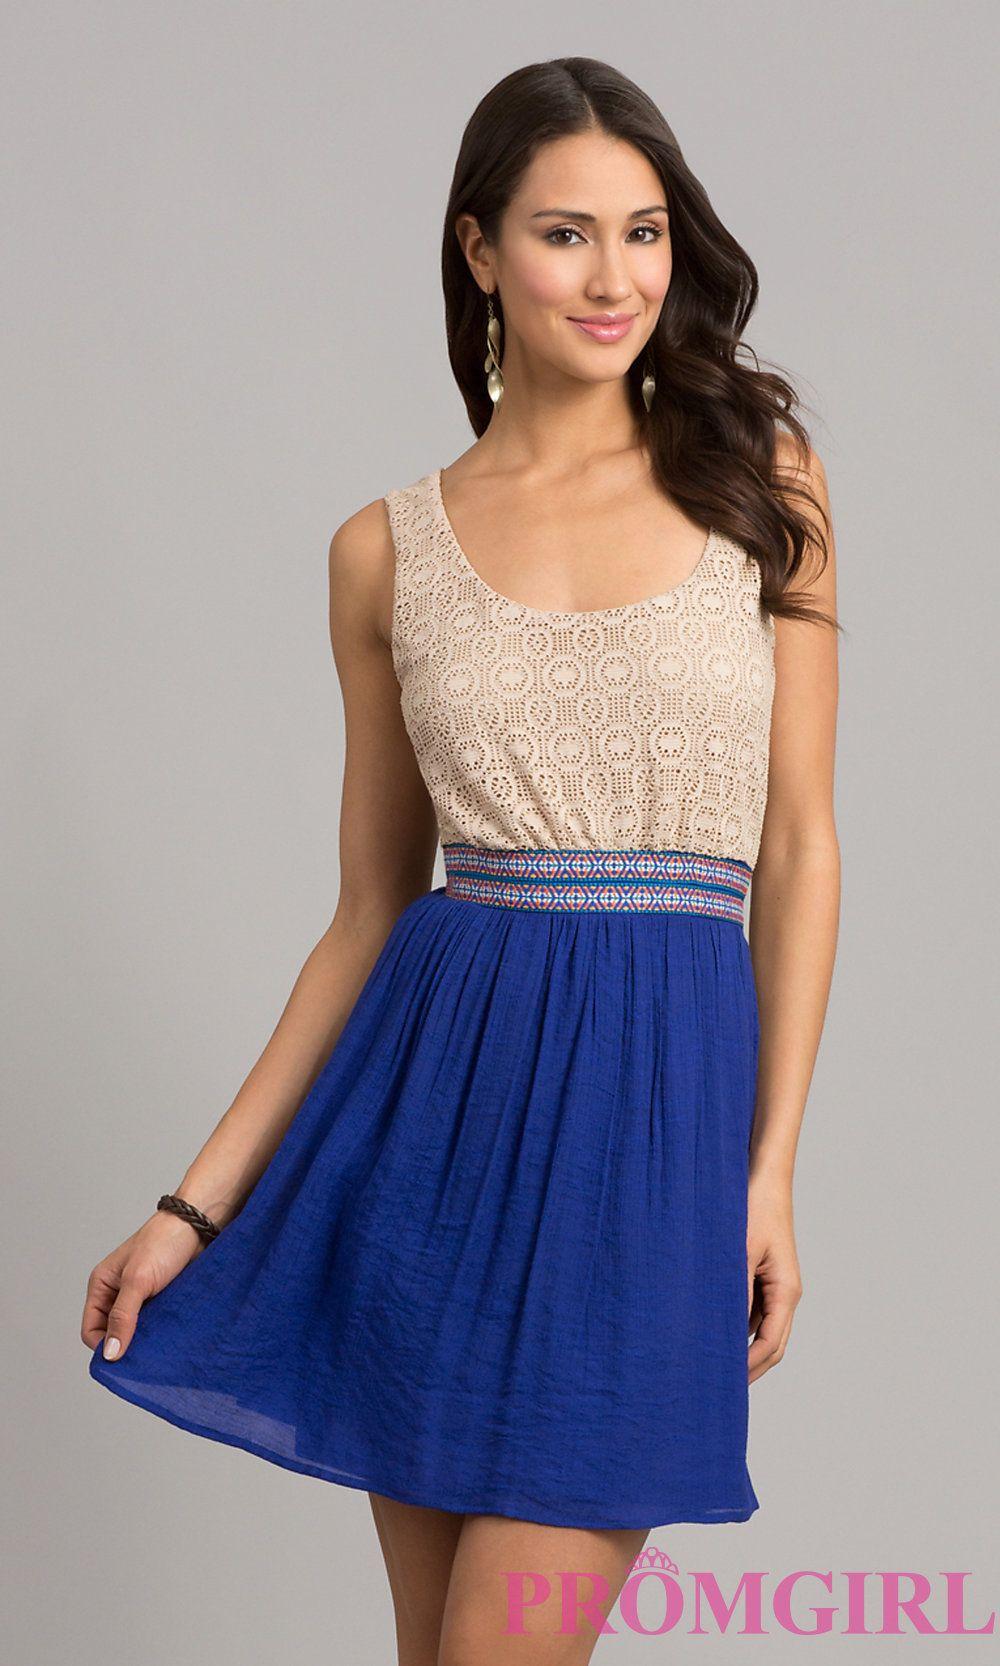 343e6f7c99c Casual Dresses Promgirl